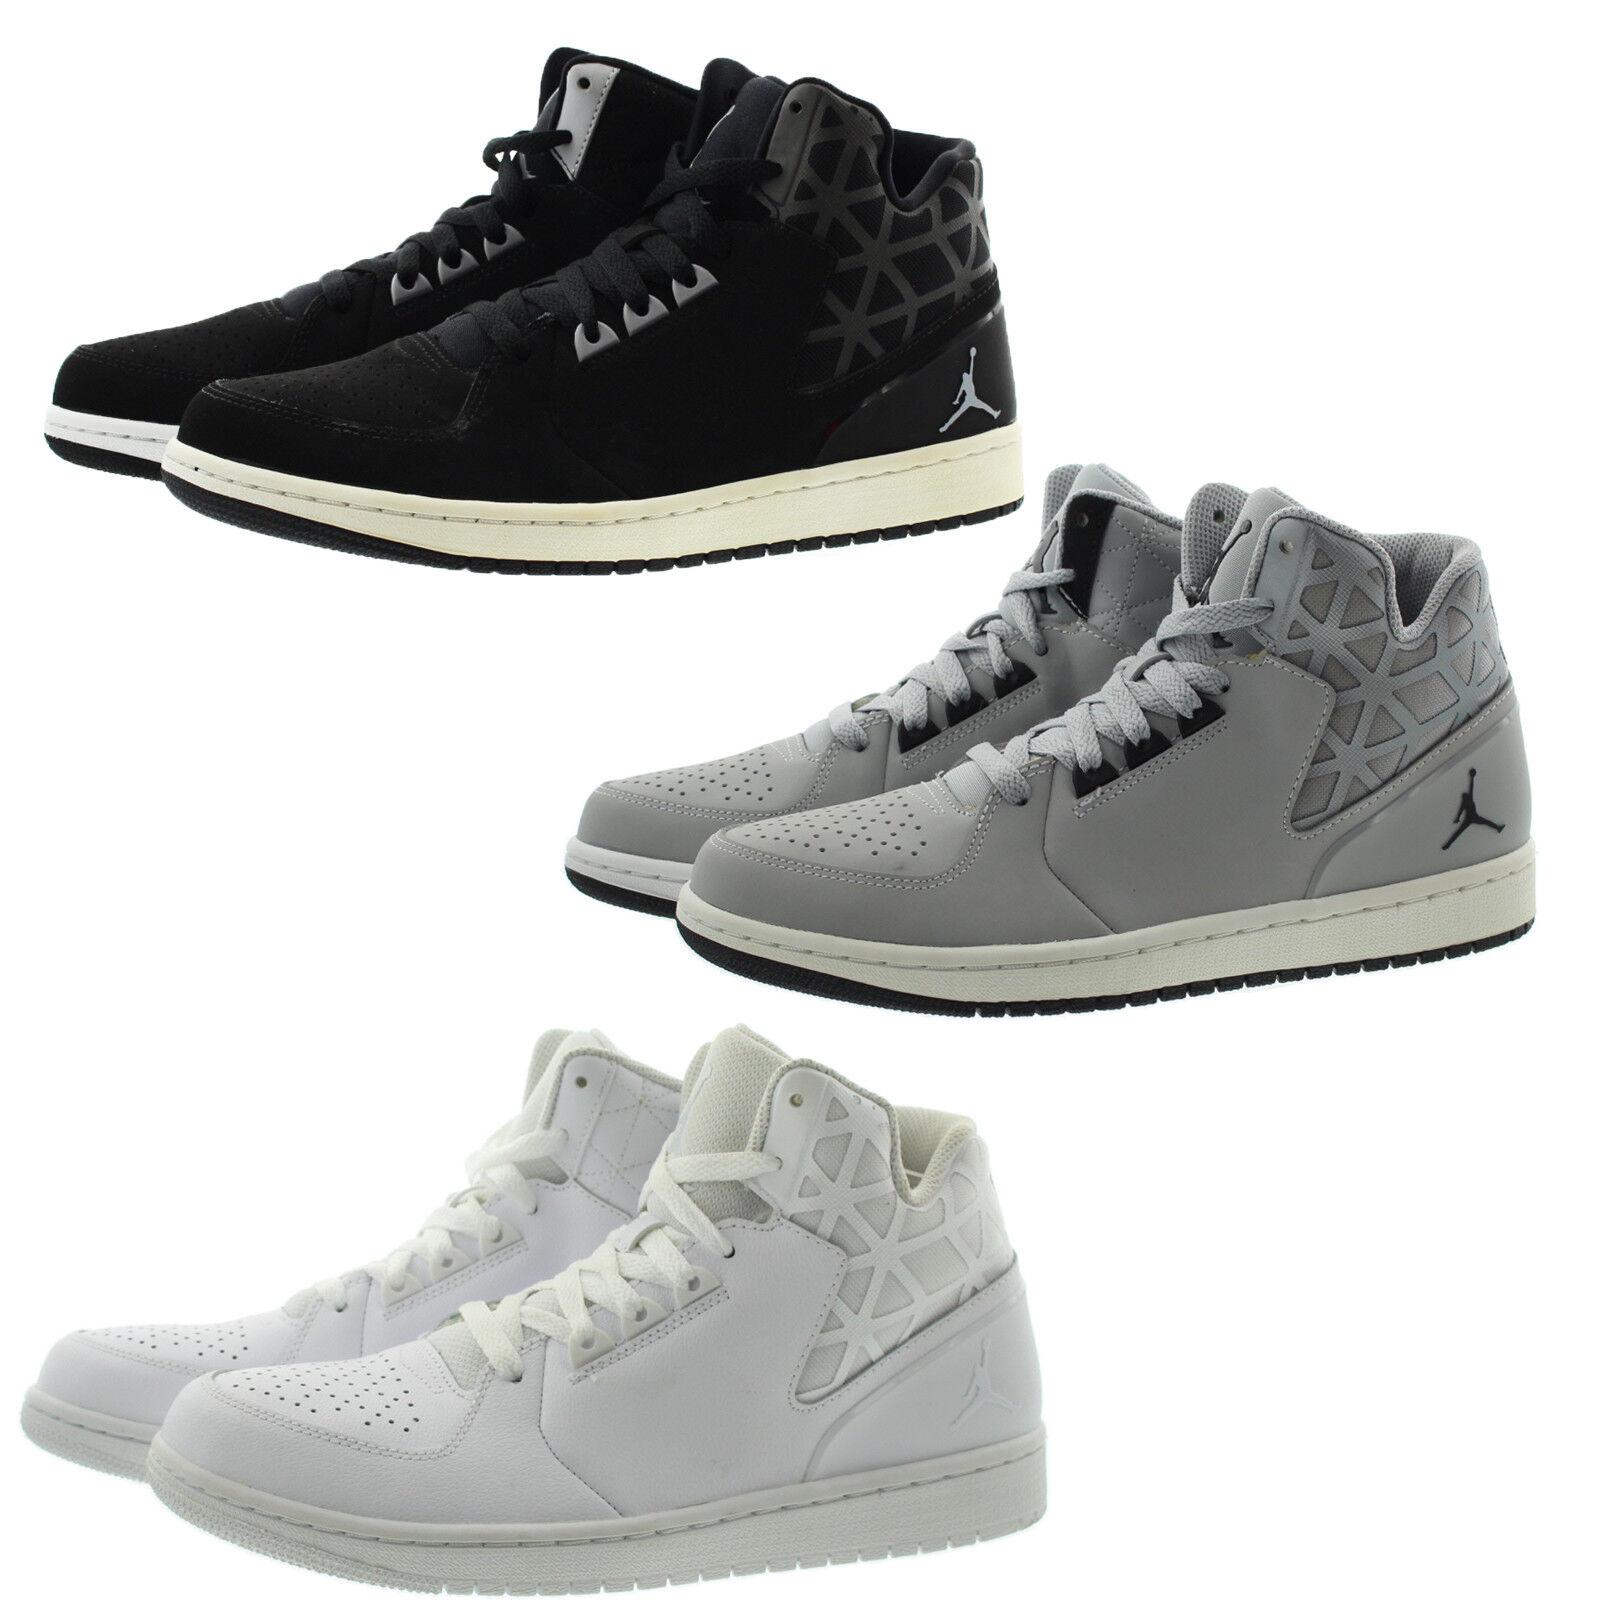 timeless design ecc8d 79d03 Nike 706954 Mens Air Jordan 1 Flight 3 Casual Basketball Shoes Sneakers